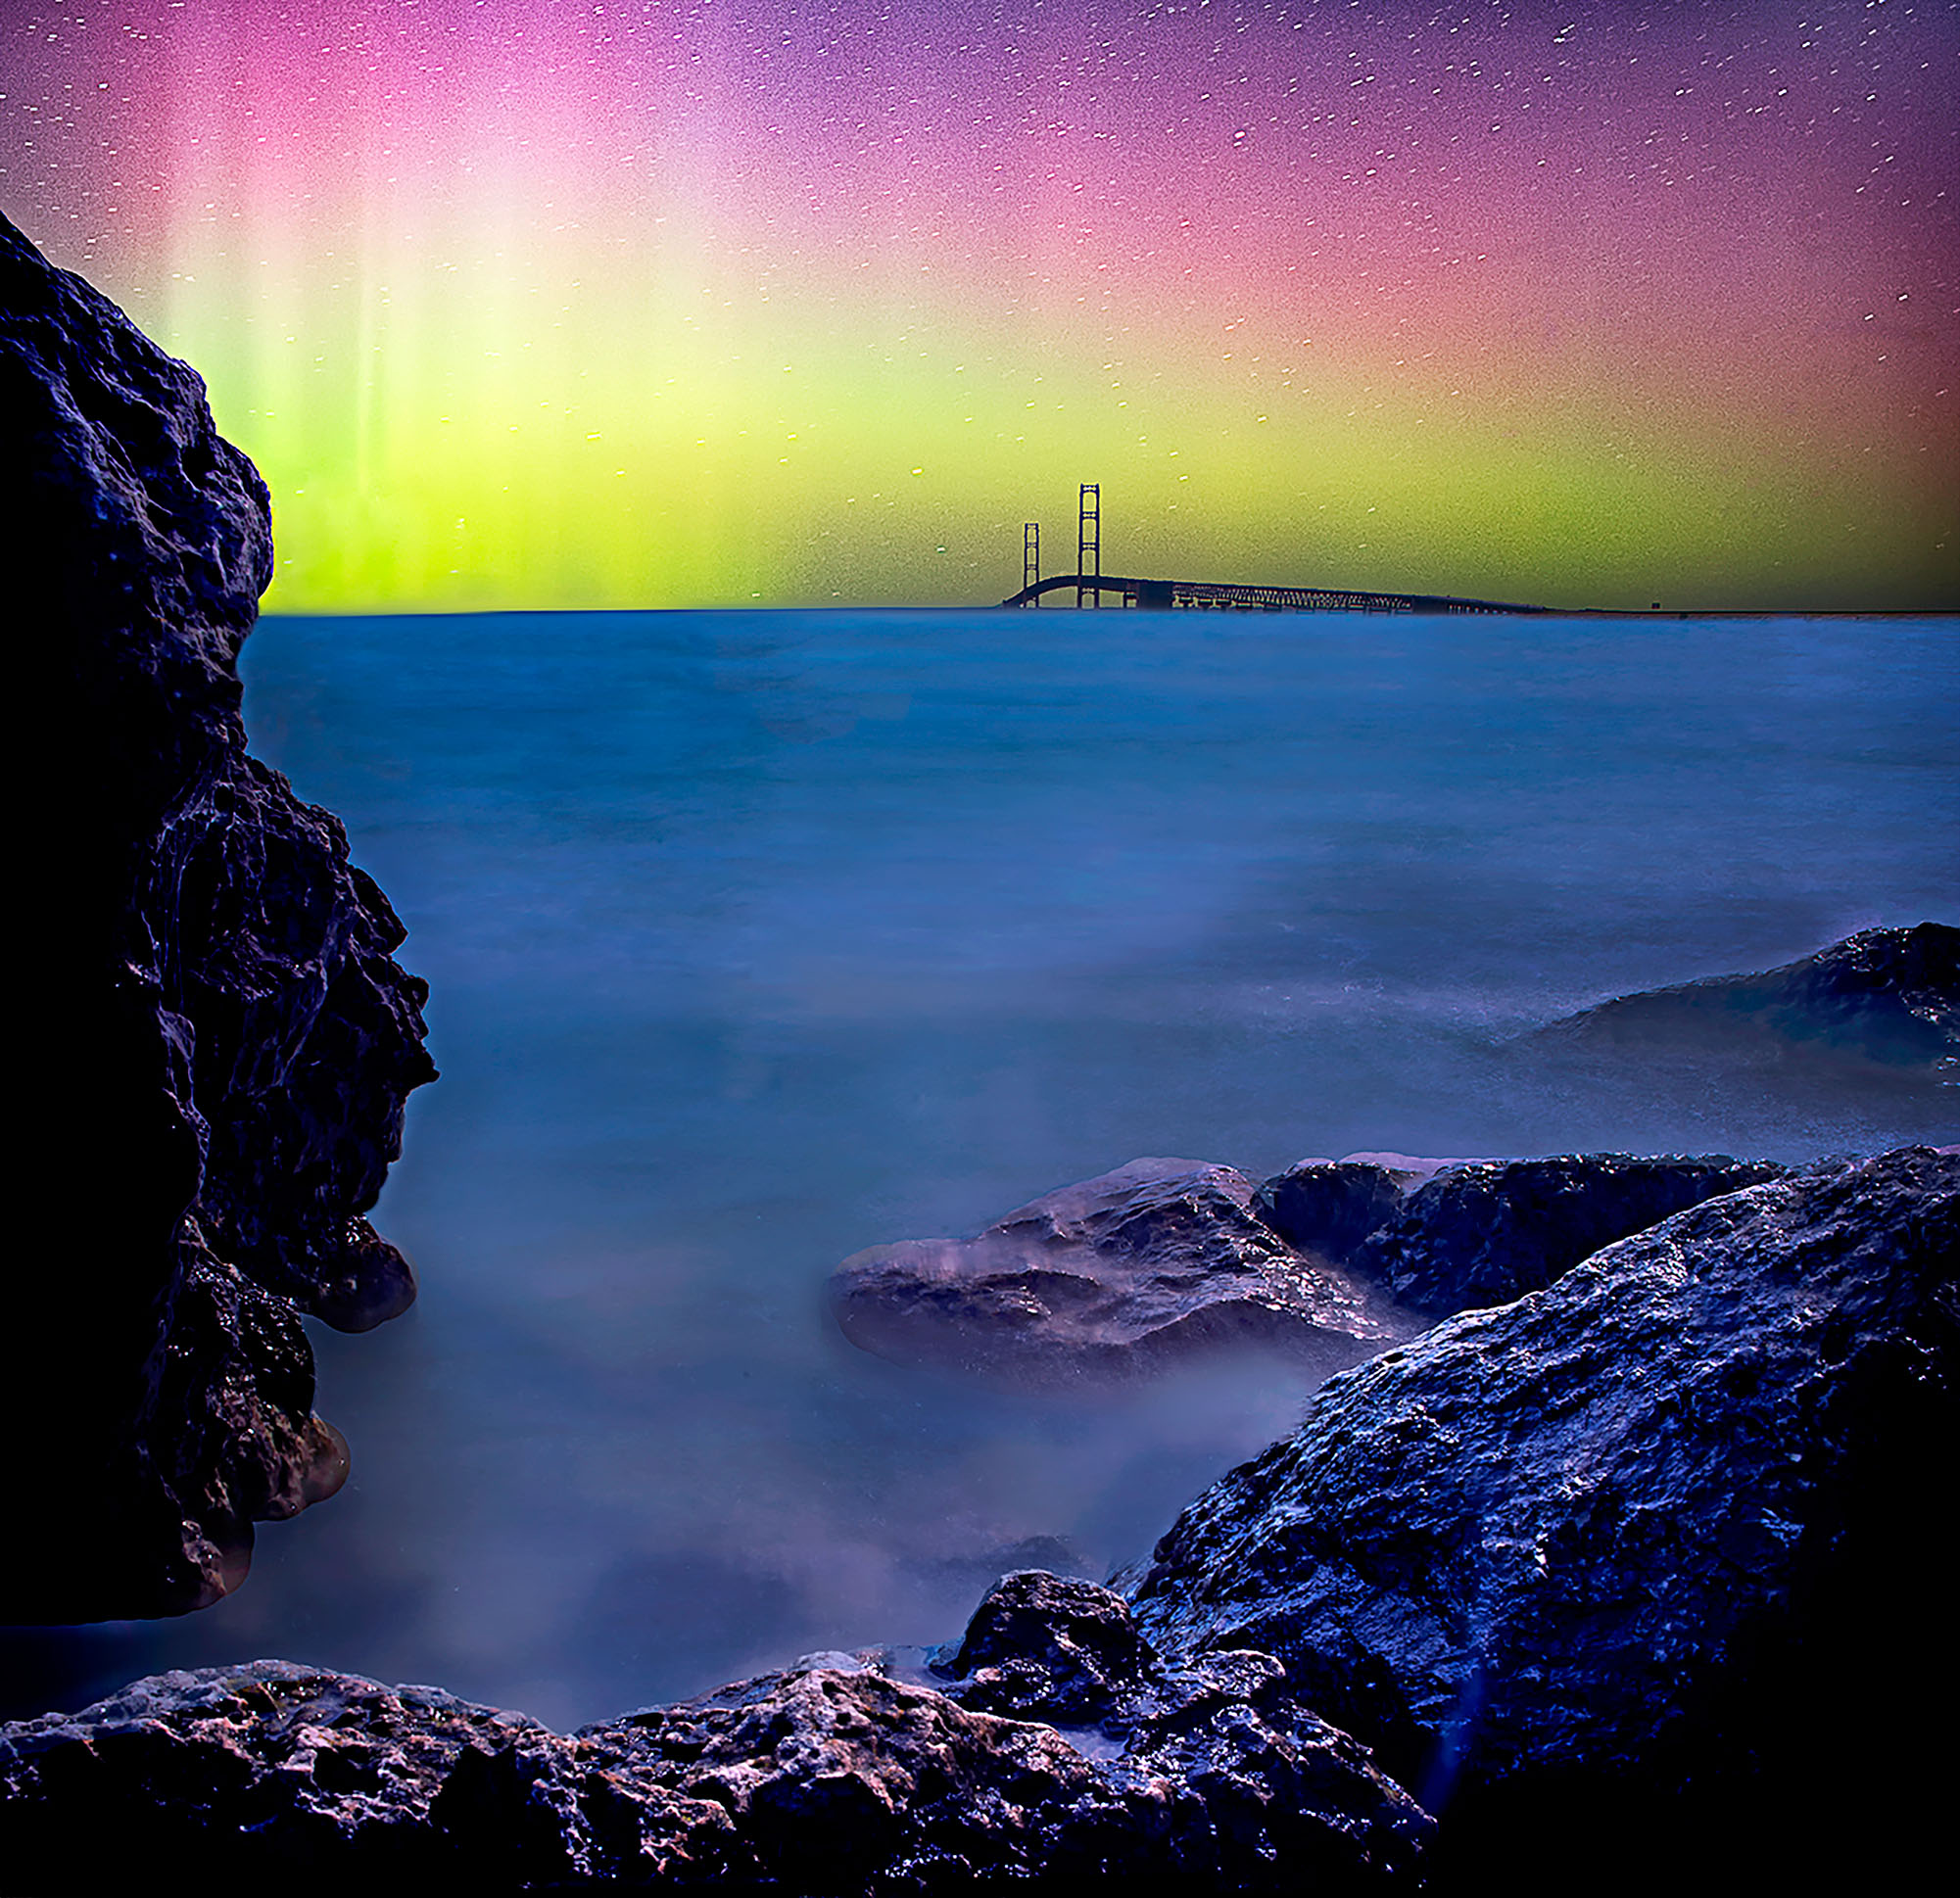 Northern Lights. Gordon Somers/Getty